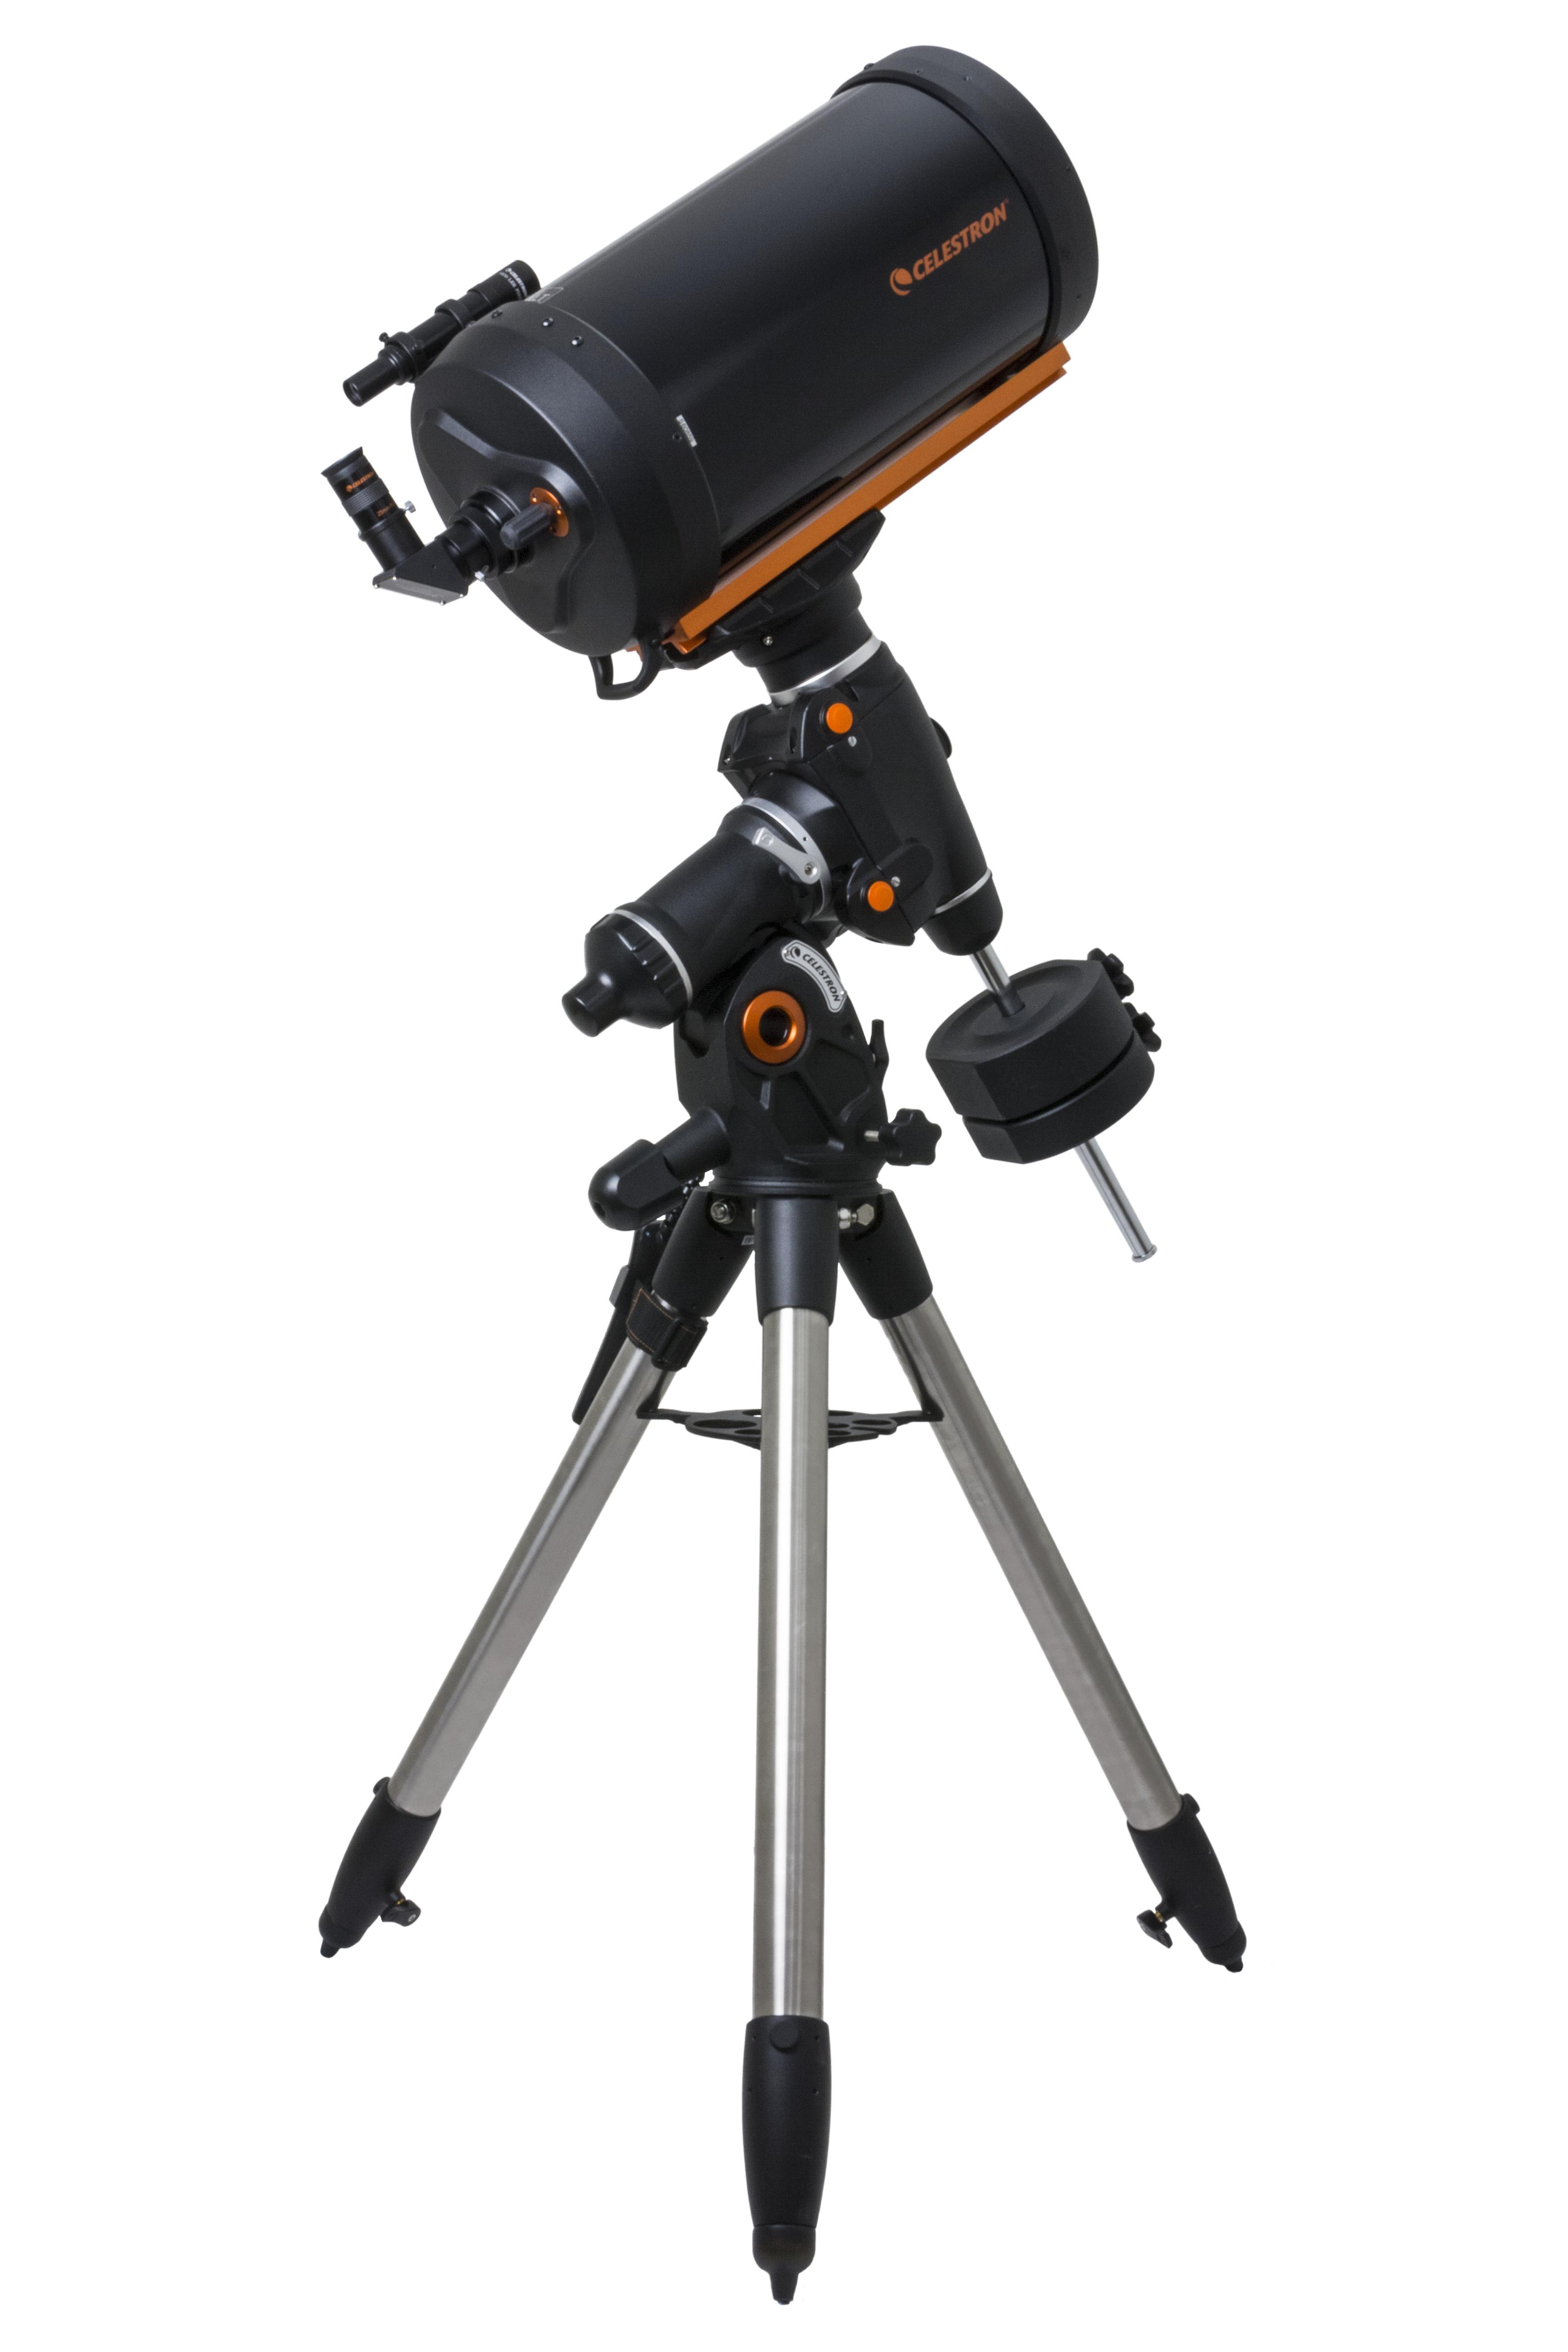 Celestron CGEM II 9 25'' (925) SCT Telescope